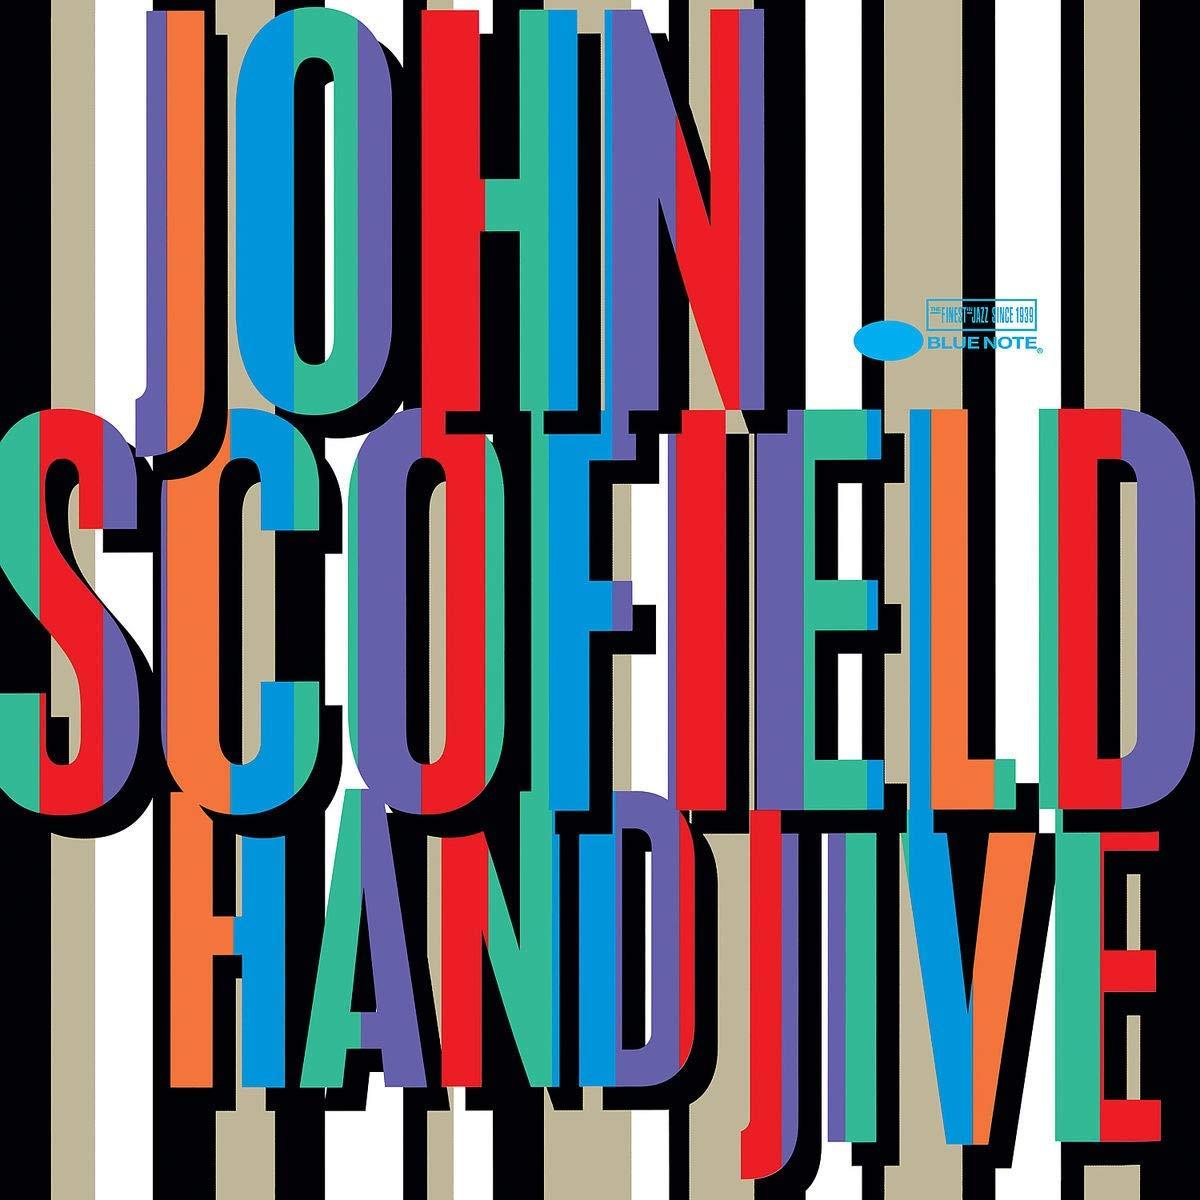 John Scofield - Hand Jive (1994) [FLAC] Download